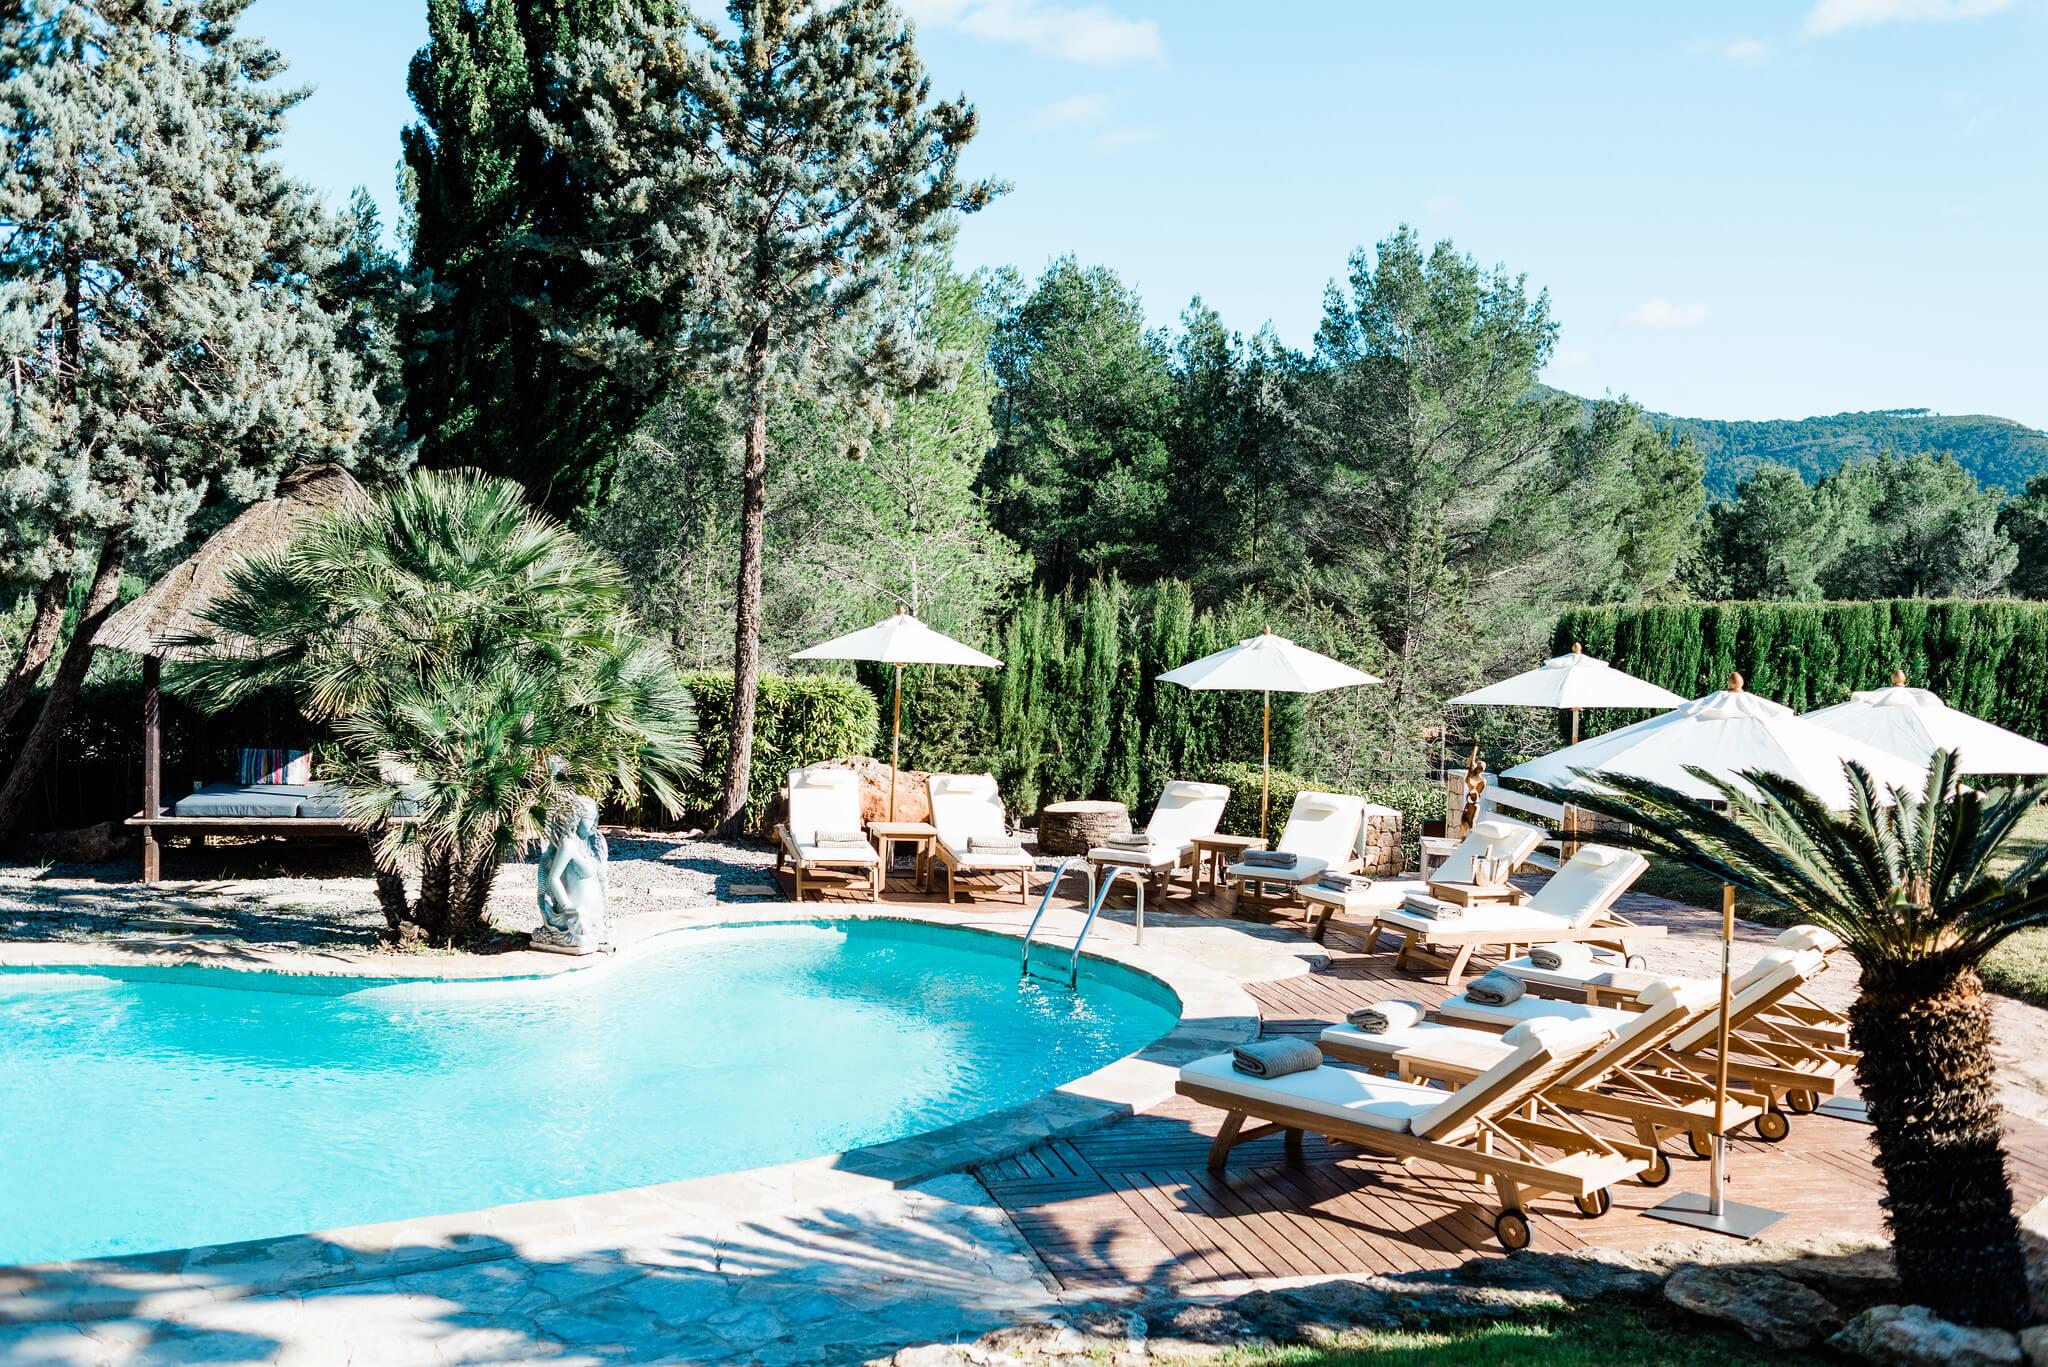 https://www.white-ibiza.com/wp-content/uploads/2020/05/white-ibiza-villas-can-verde-exterior-sun-loungers-round-pool.jpg